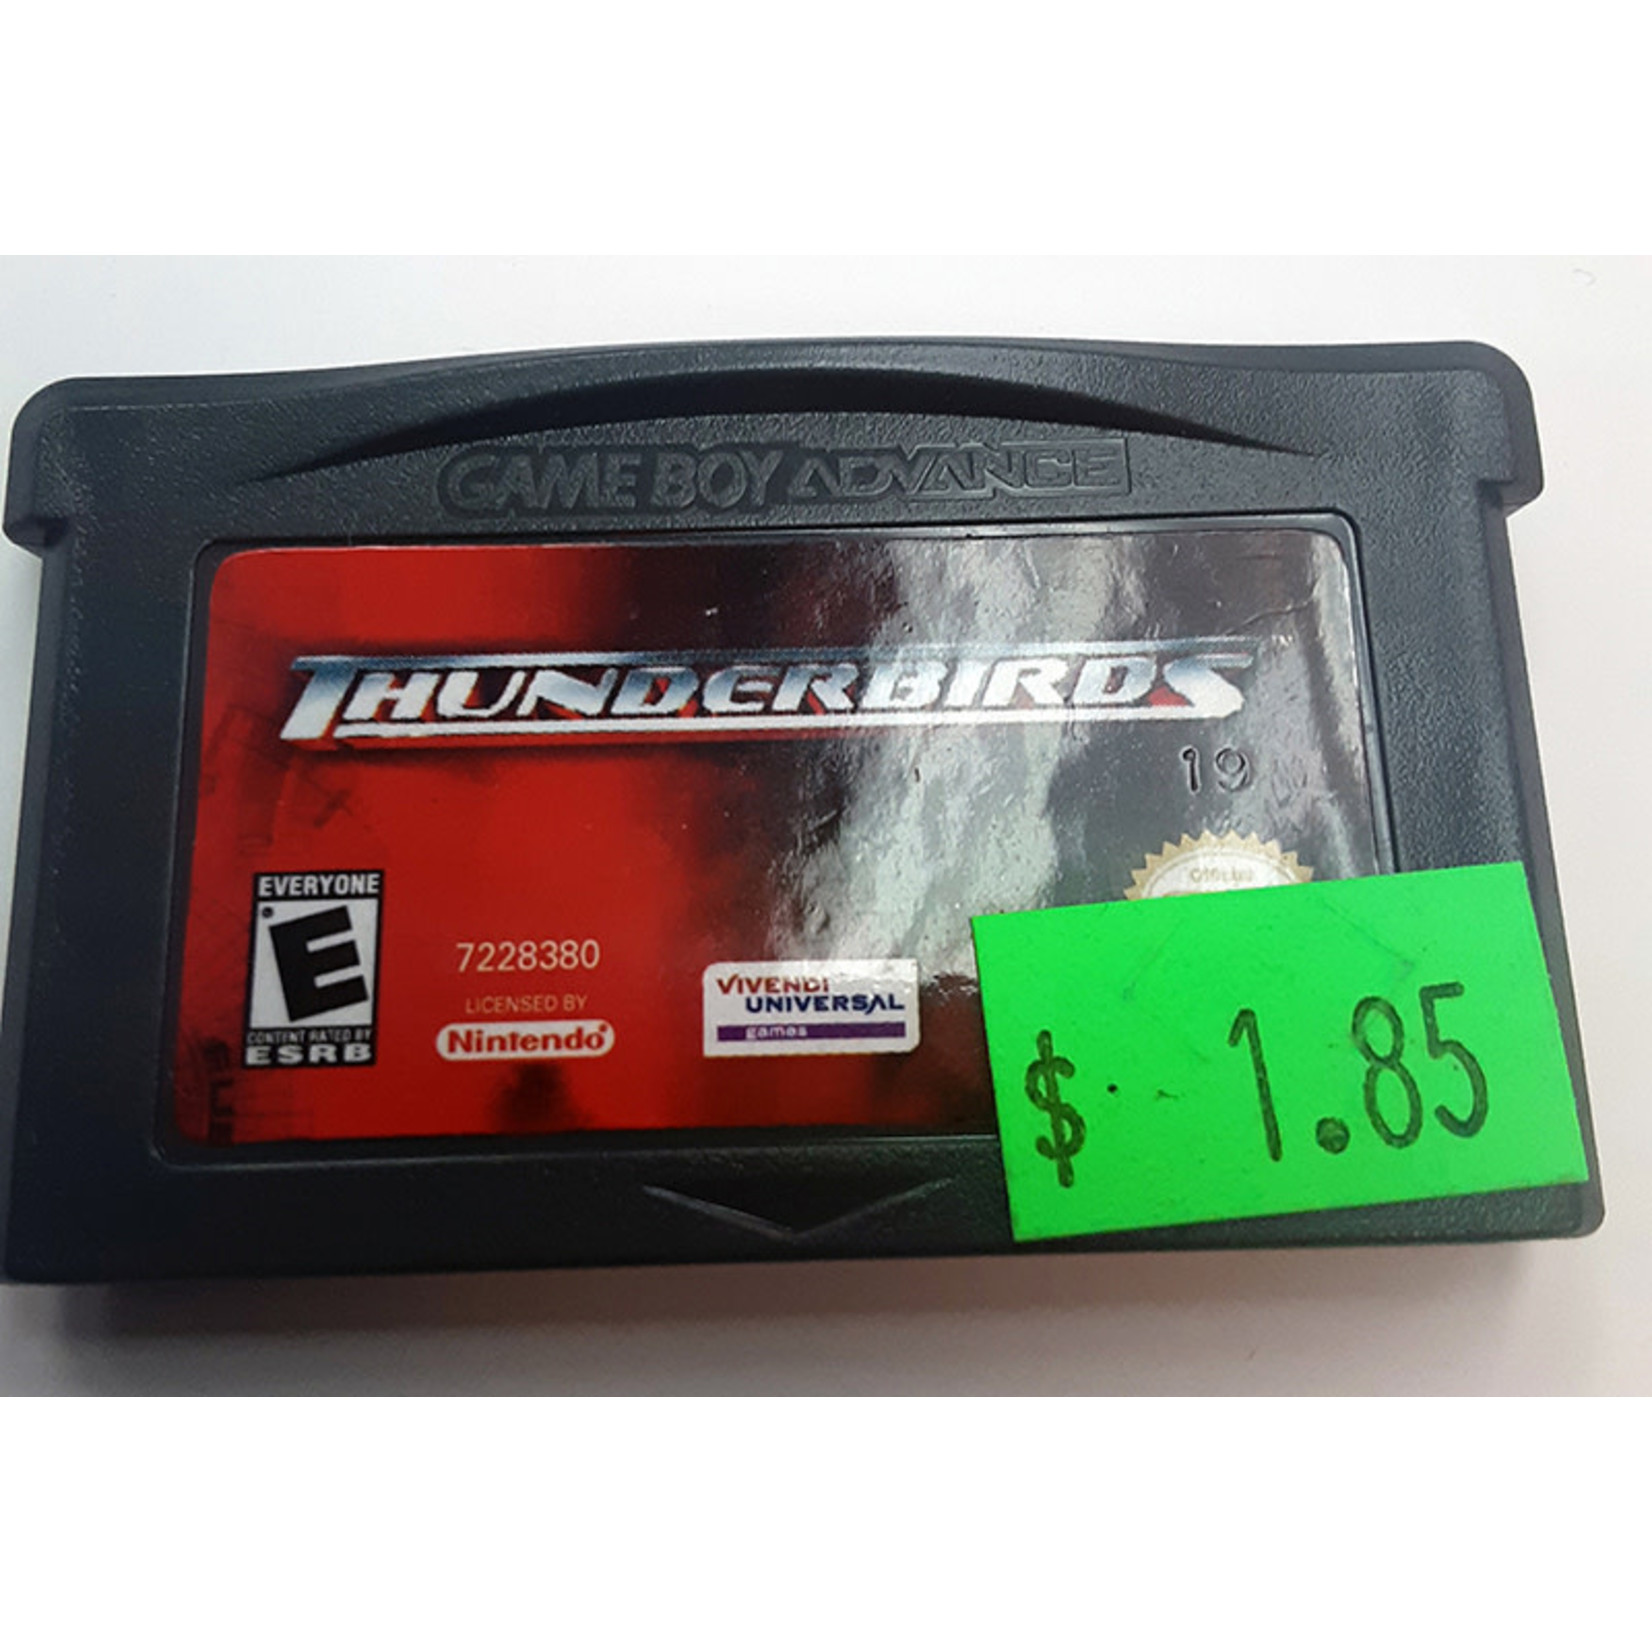 GBAu-Thunderbirds (cartridge)